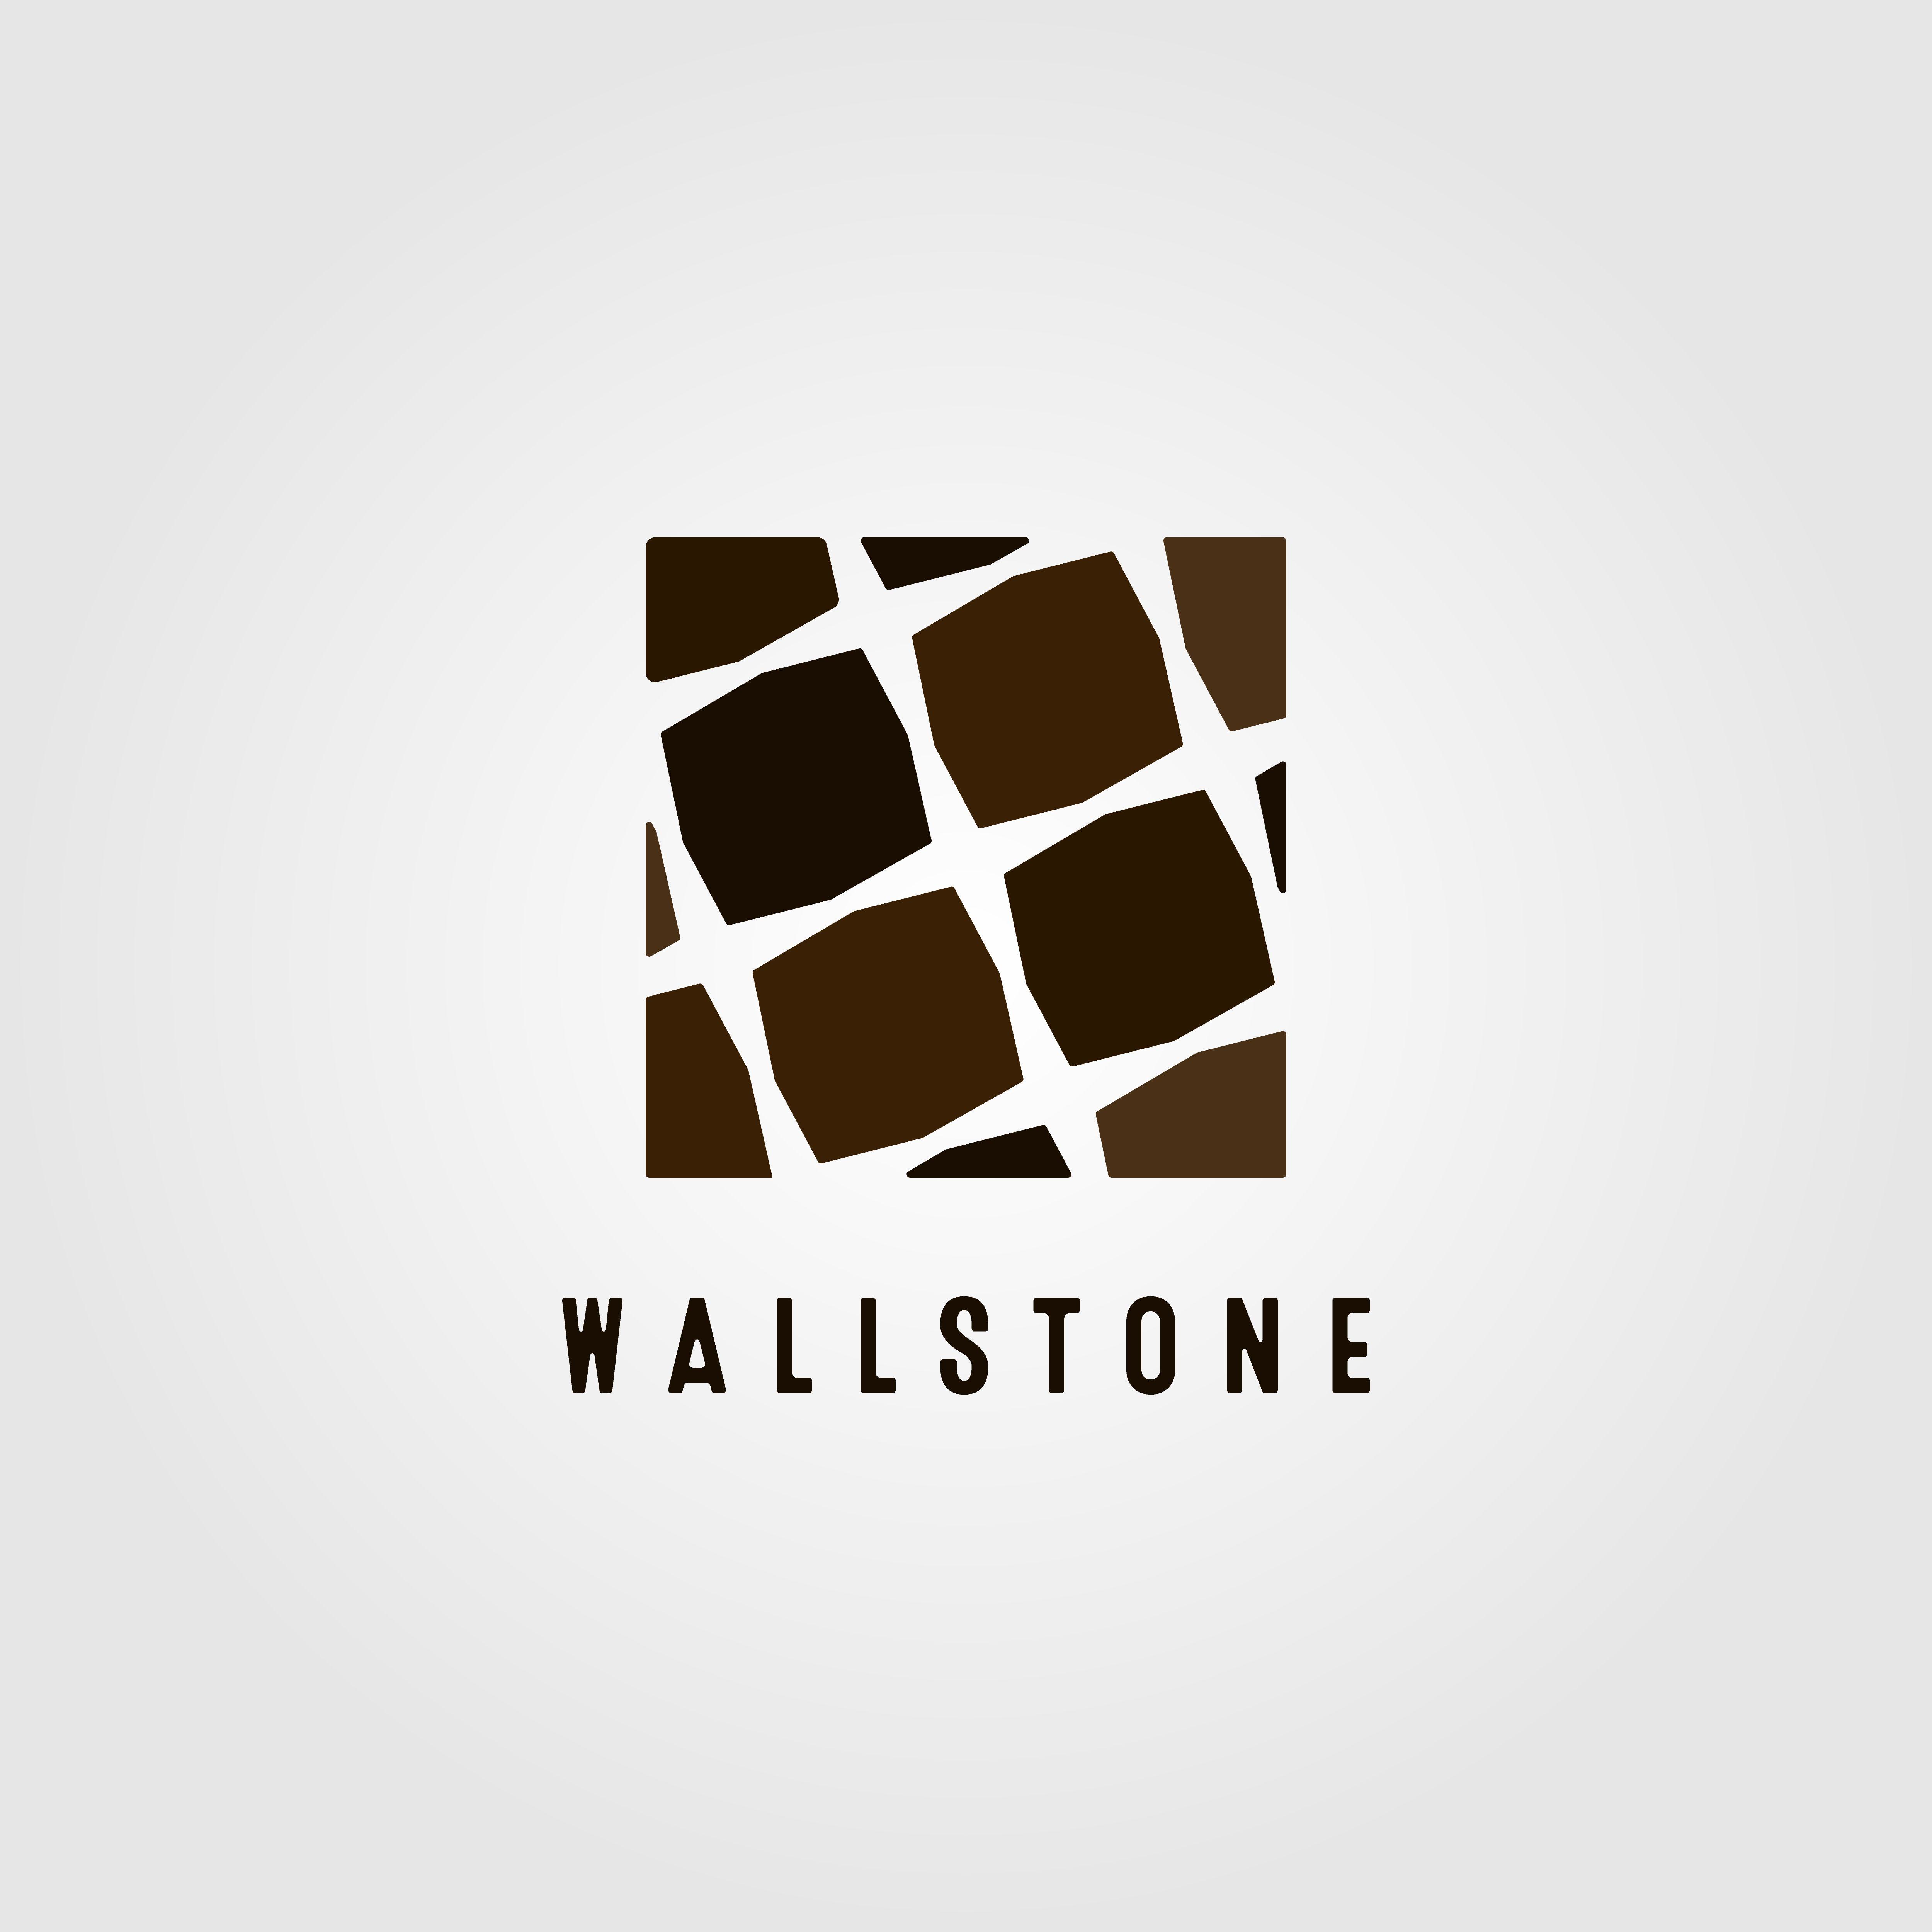 Carpentry Wall Stone Logo Design Vector Icon Illustration Brick Granite Masonry Abstract Architecture Ar Logo Design Camera Logos Design Wall Logo